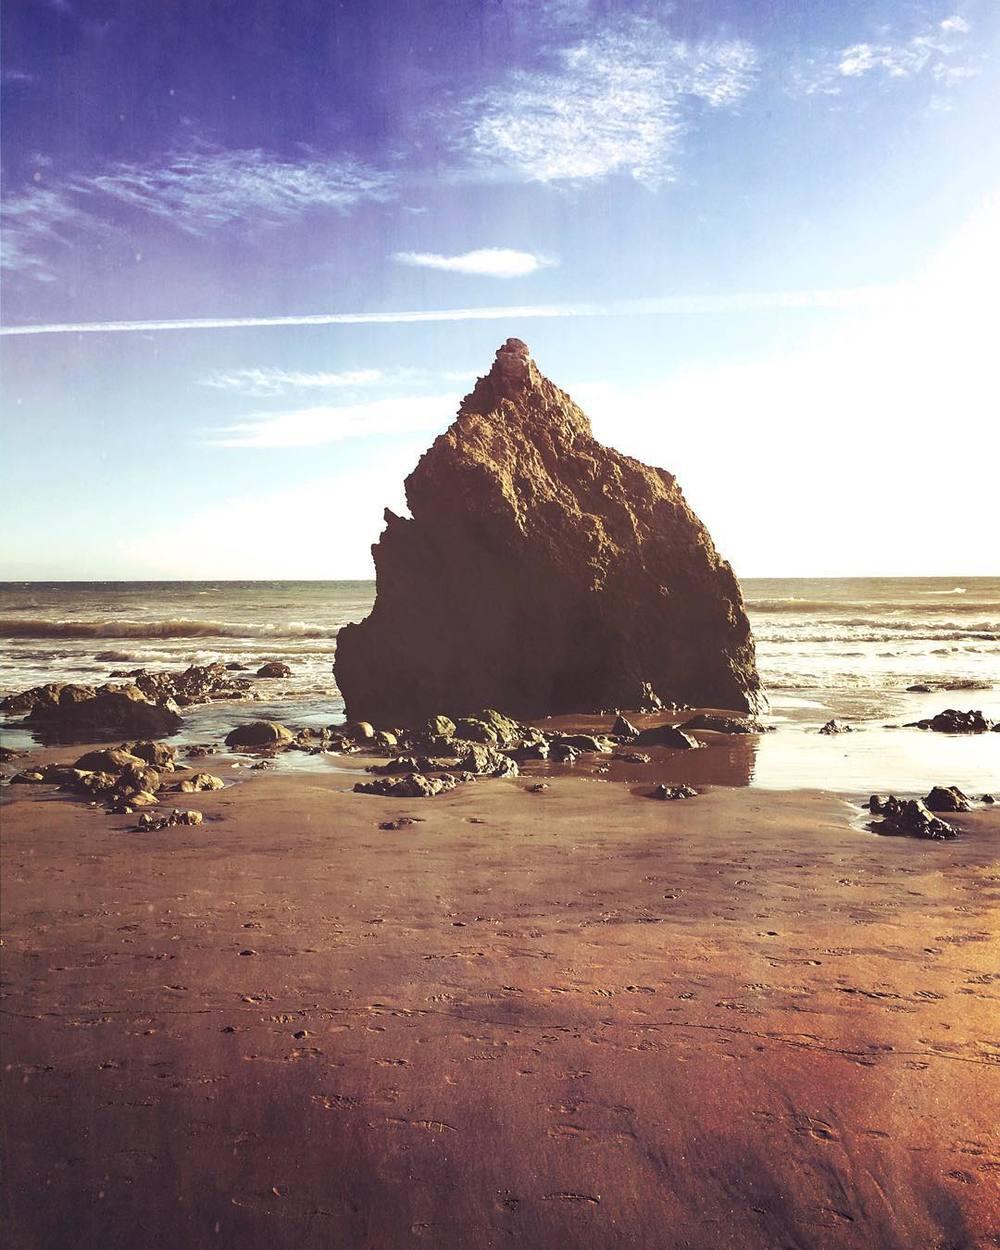 i-was-enjoying-some-creative-grimy-time-editing-this-rock-malibu-is-full-of-fun-ya-beach-ocean-elmatadorbeach-on-the-way-home-from-vacation-permanent-wanderlust-359365_23428427504_o.jpg